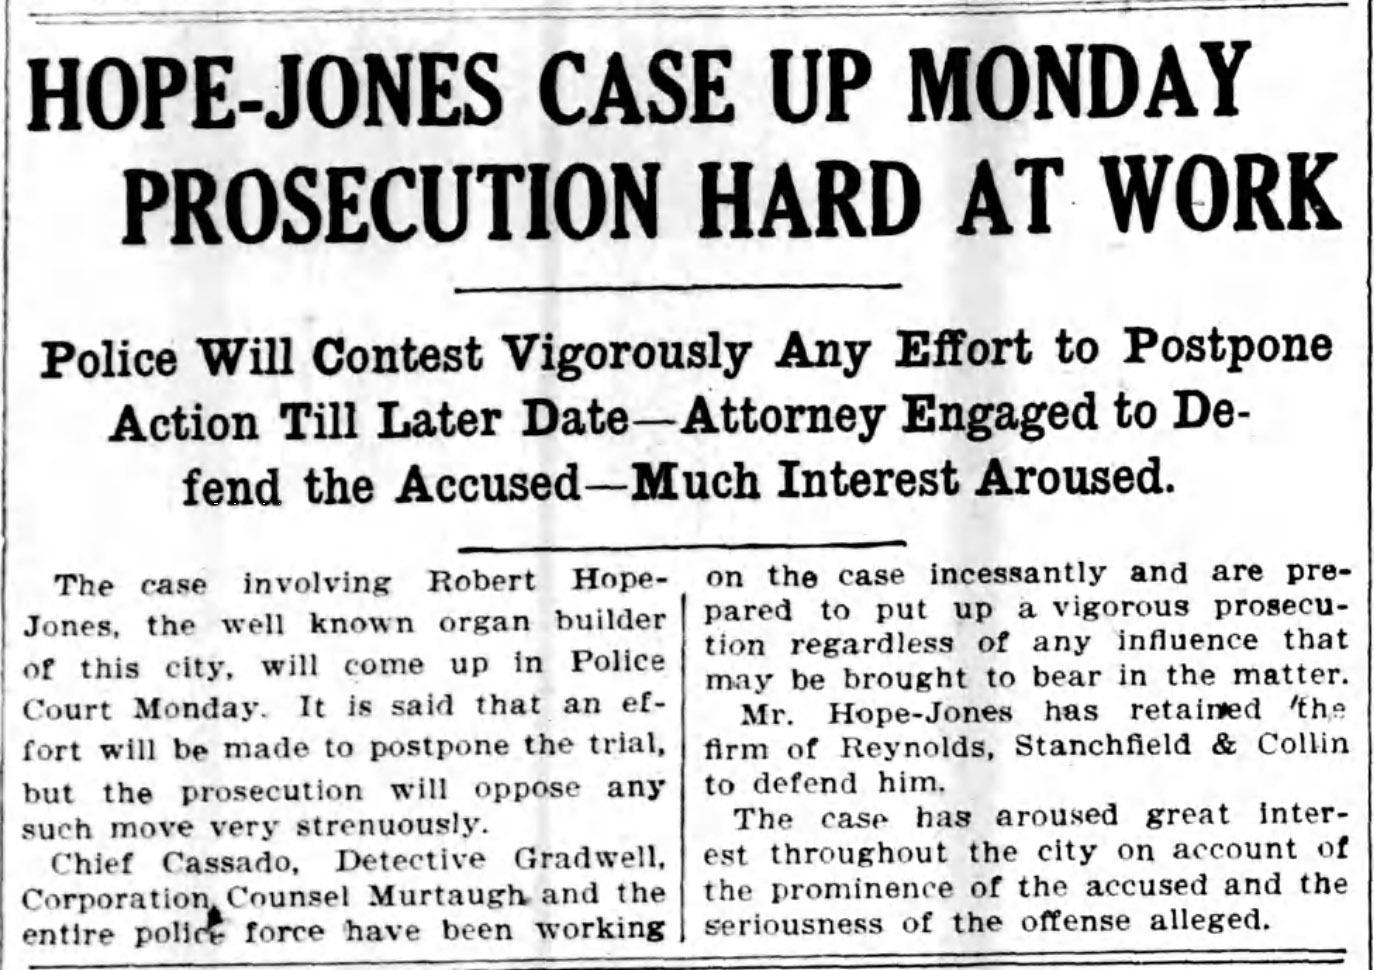 Hope-Jones case up Monday, prosecution hard at work, article (Elmira Star-Gazette, 1908-05-09).jpg